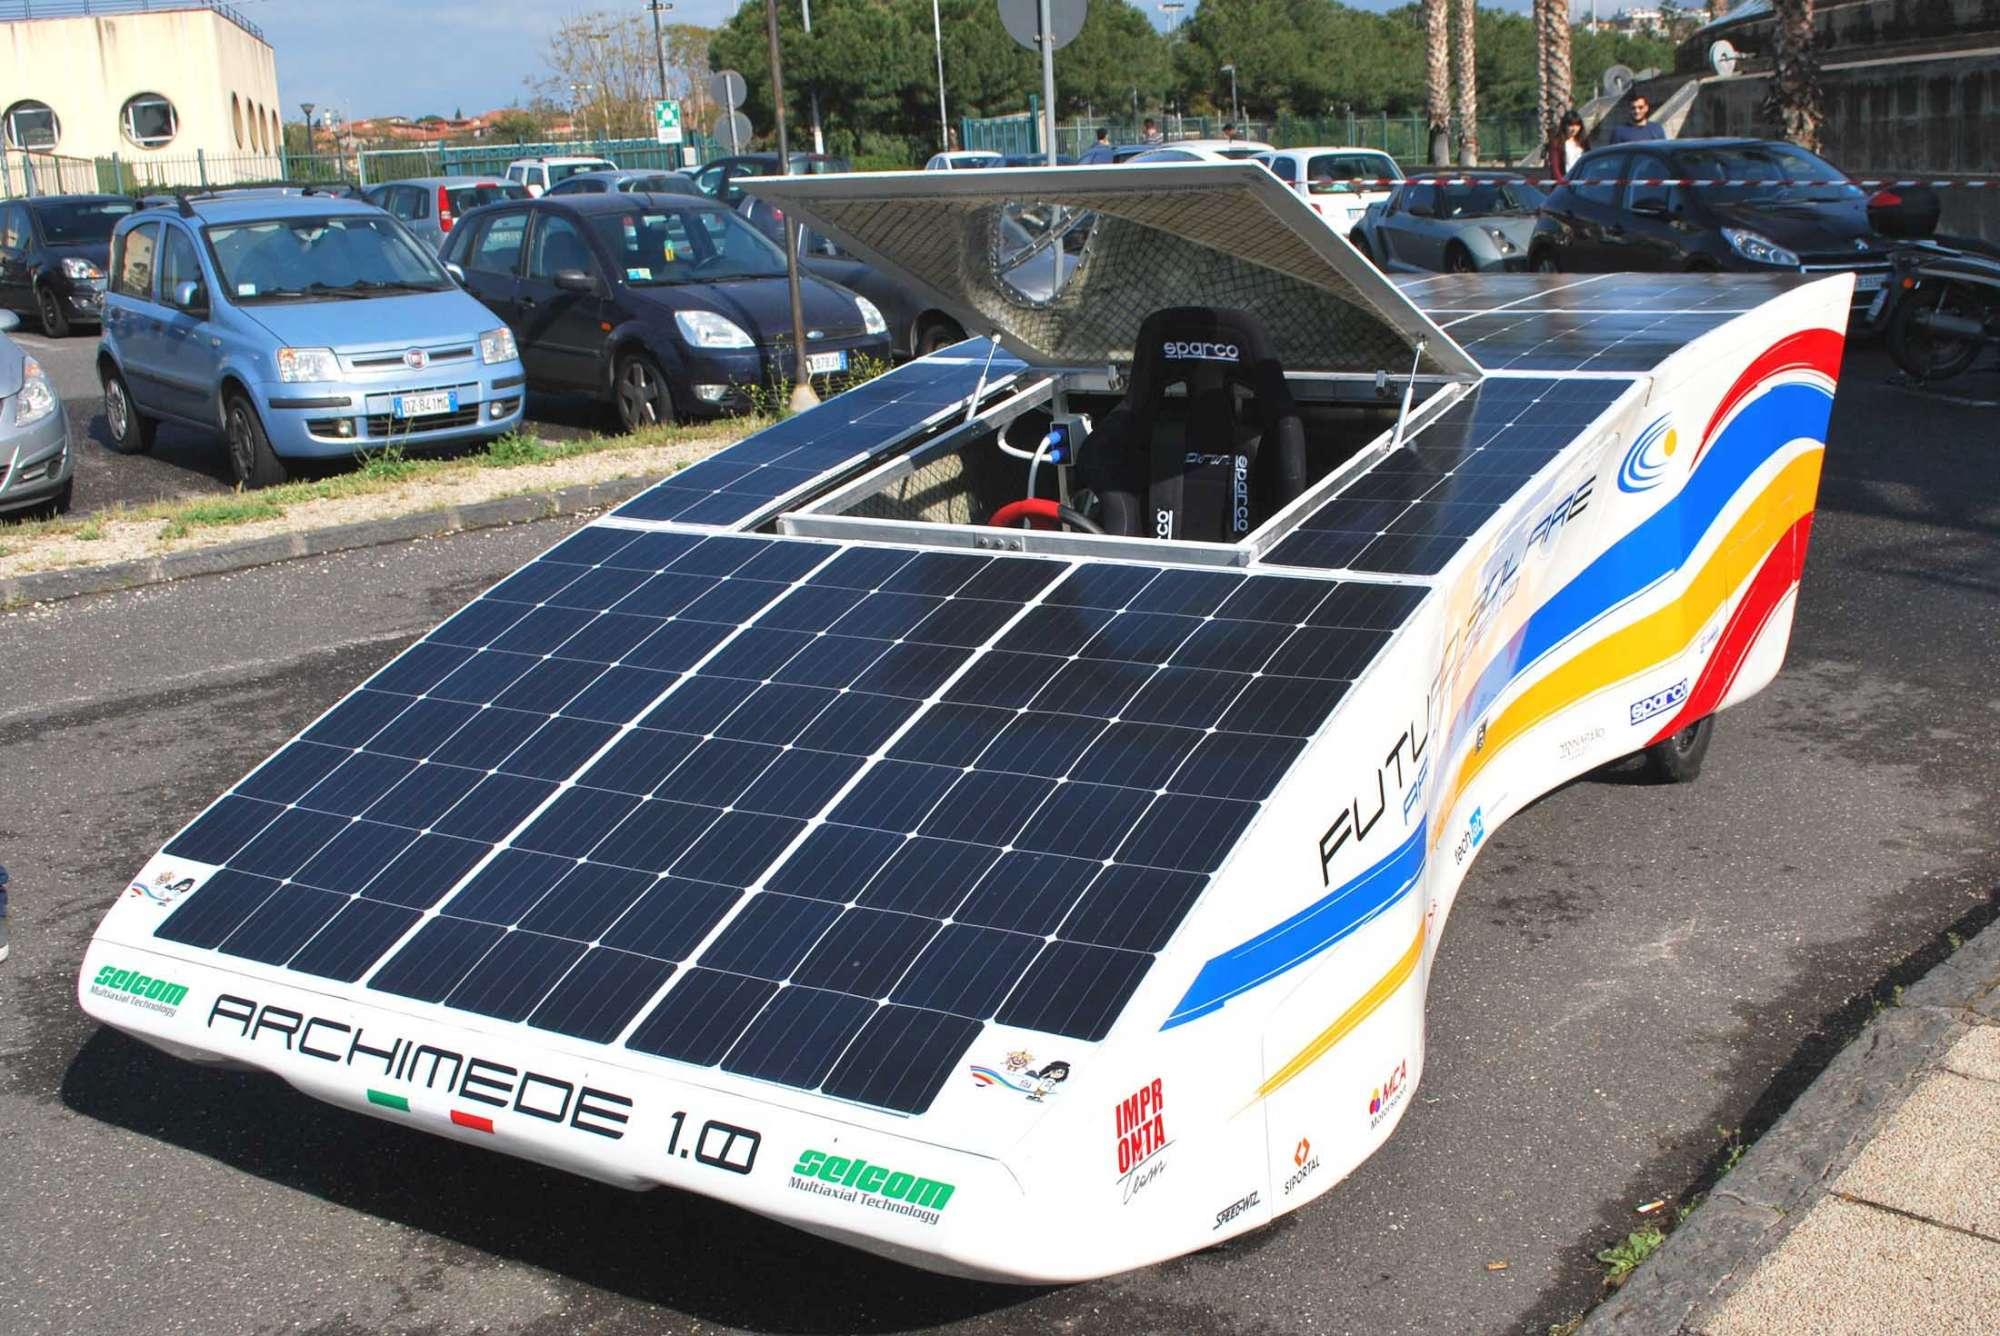 Catania, presentata Archimede solar car 1.0